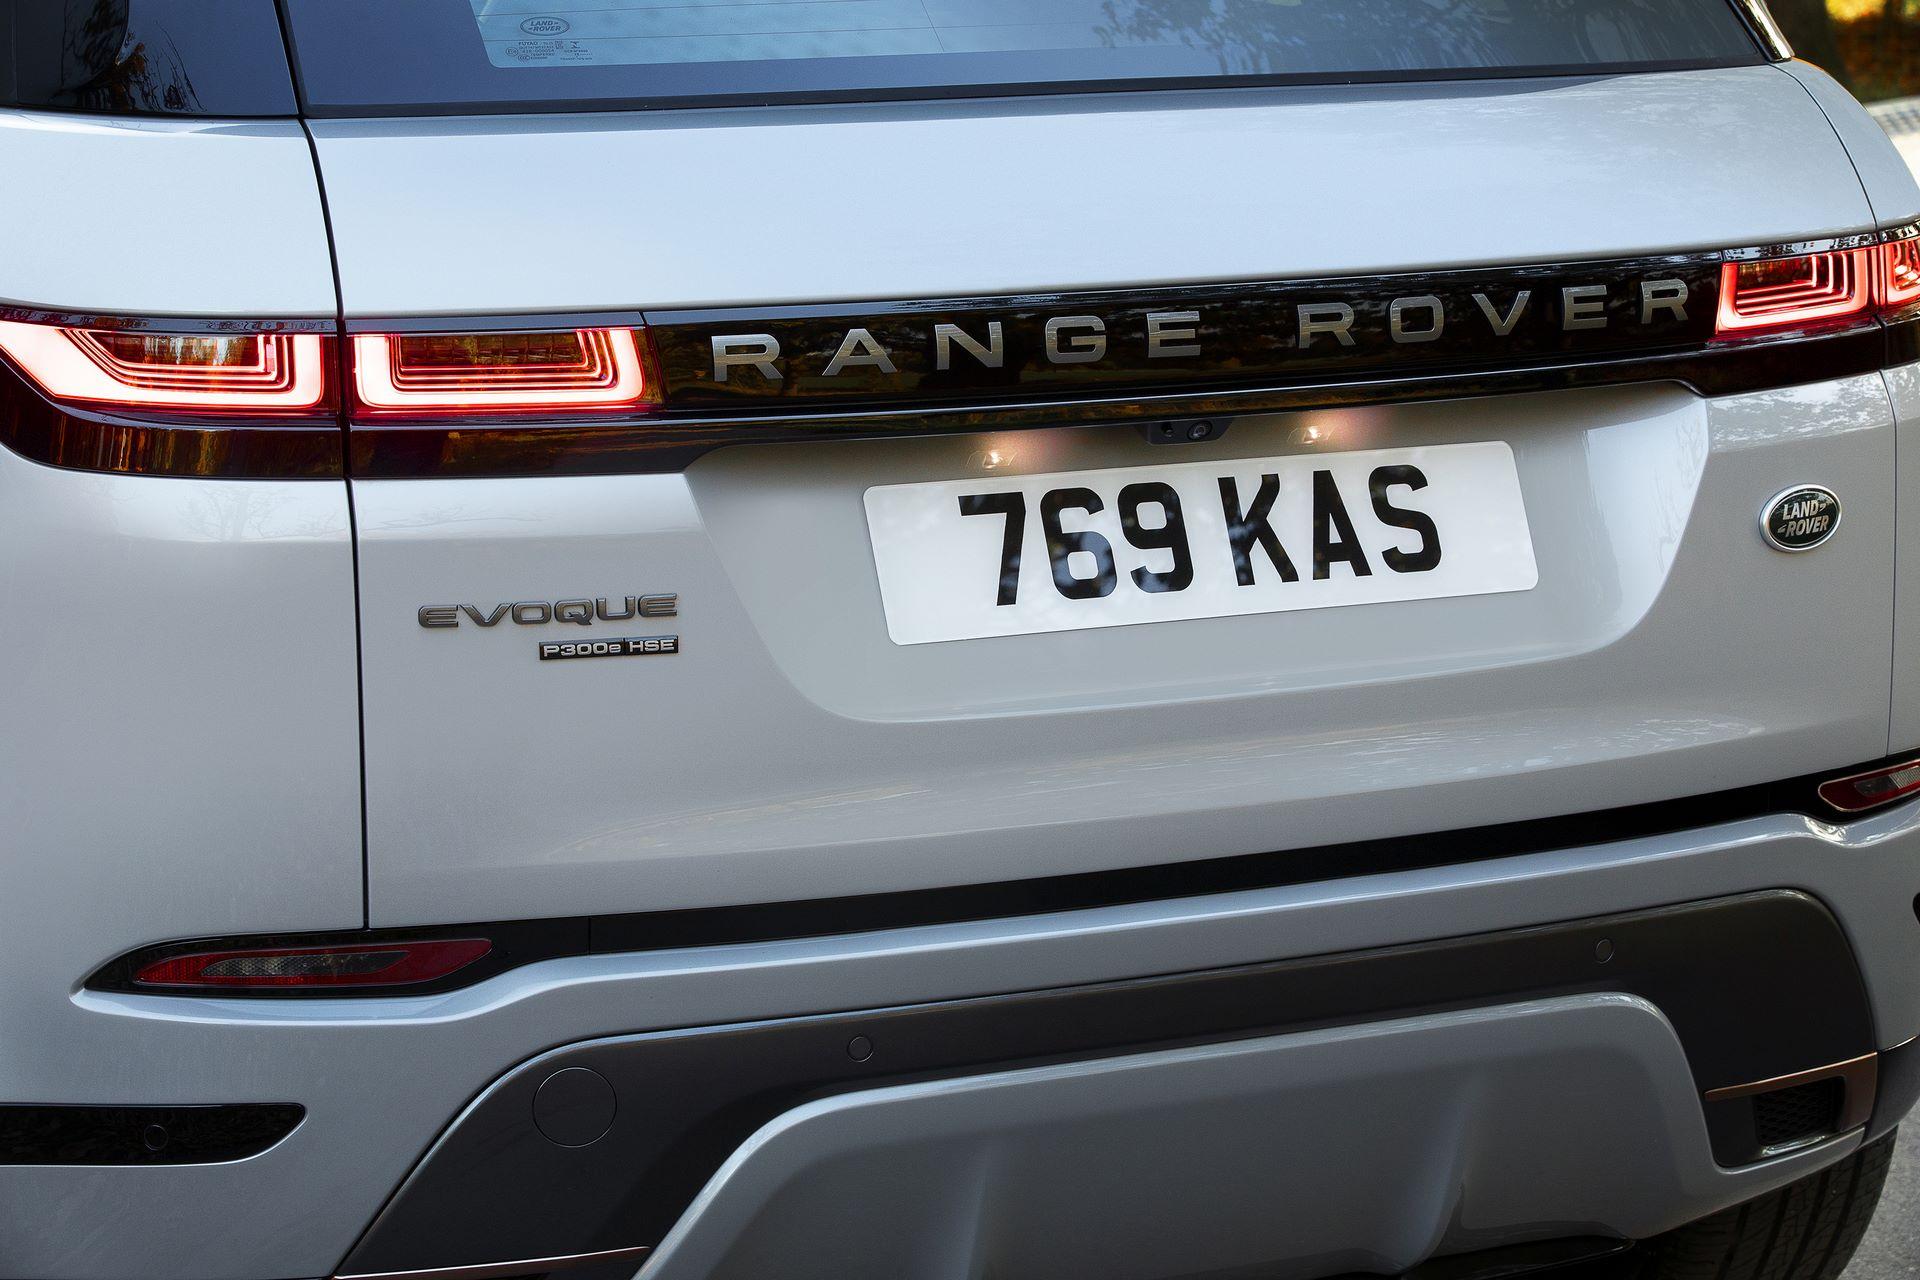 Plug-in-hybrid-Rabge-Rover-Evoque-PHEV-12